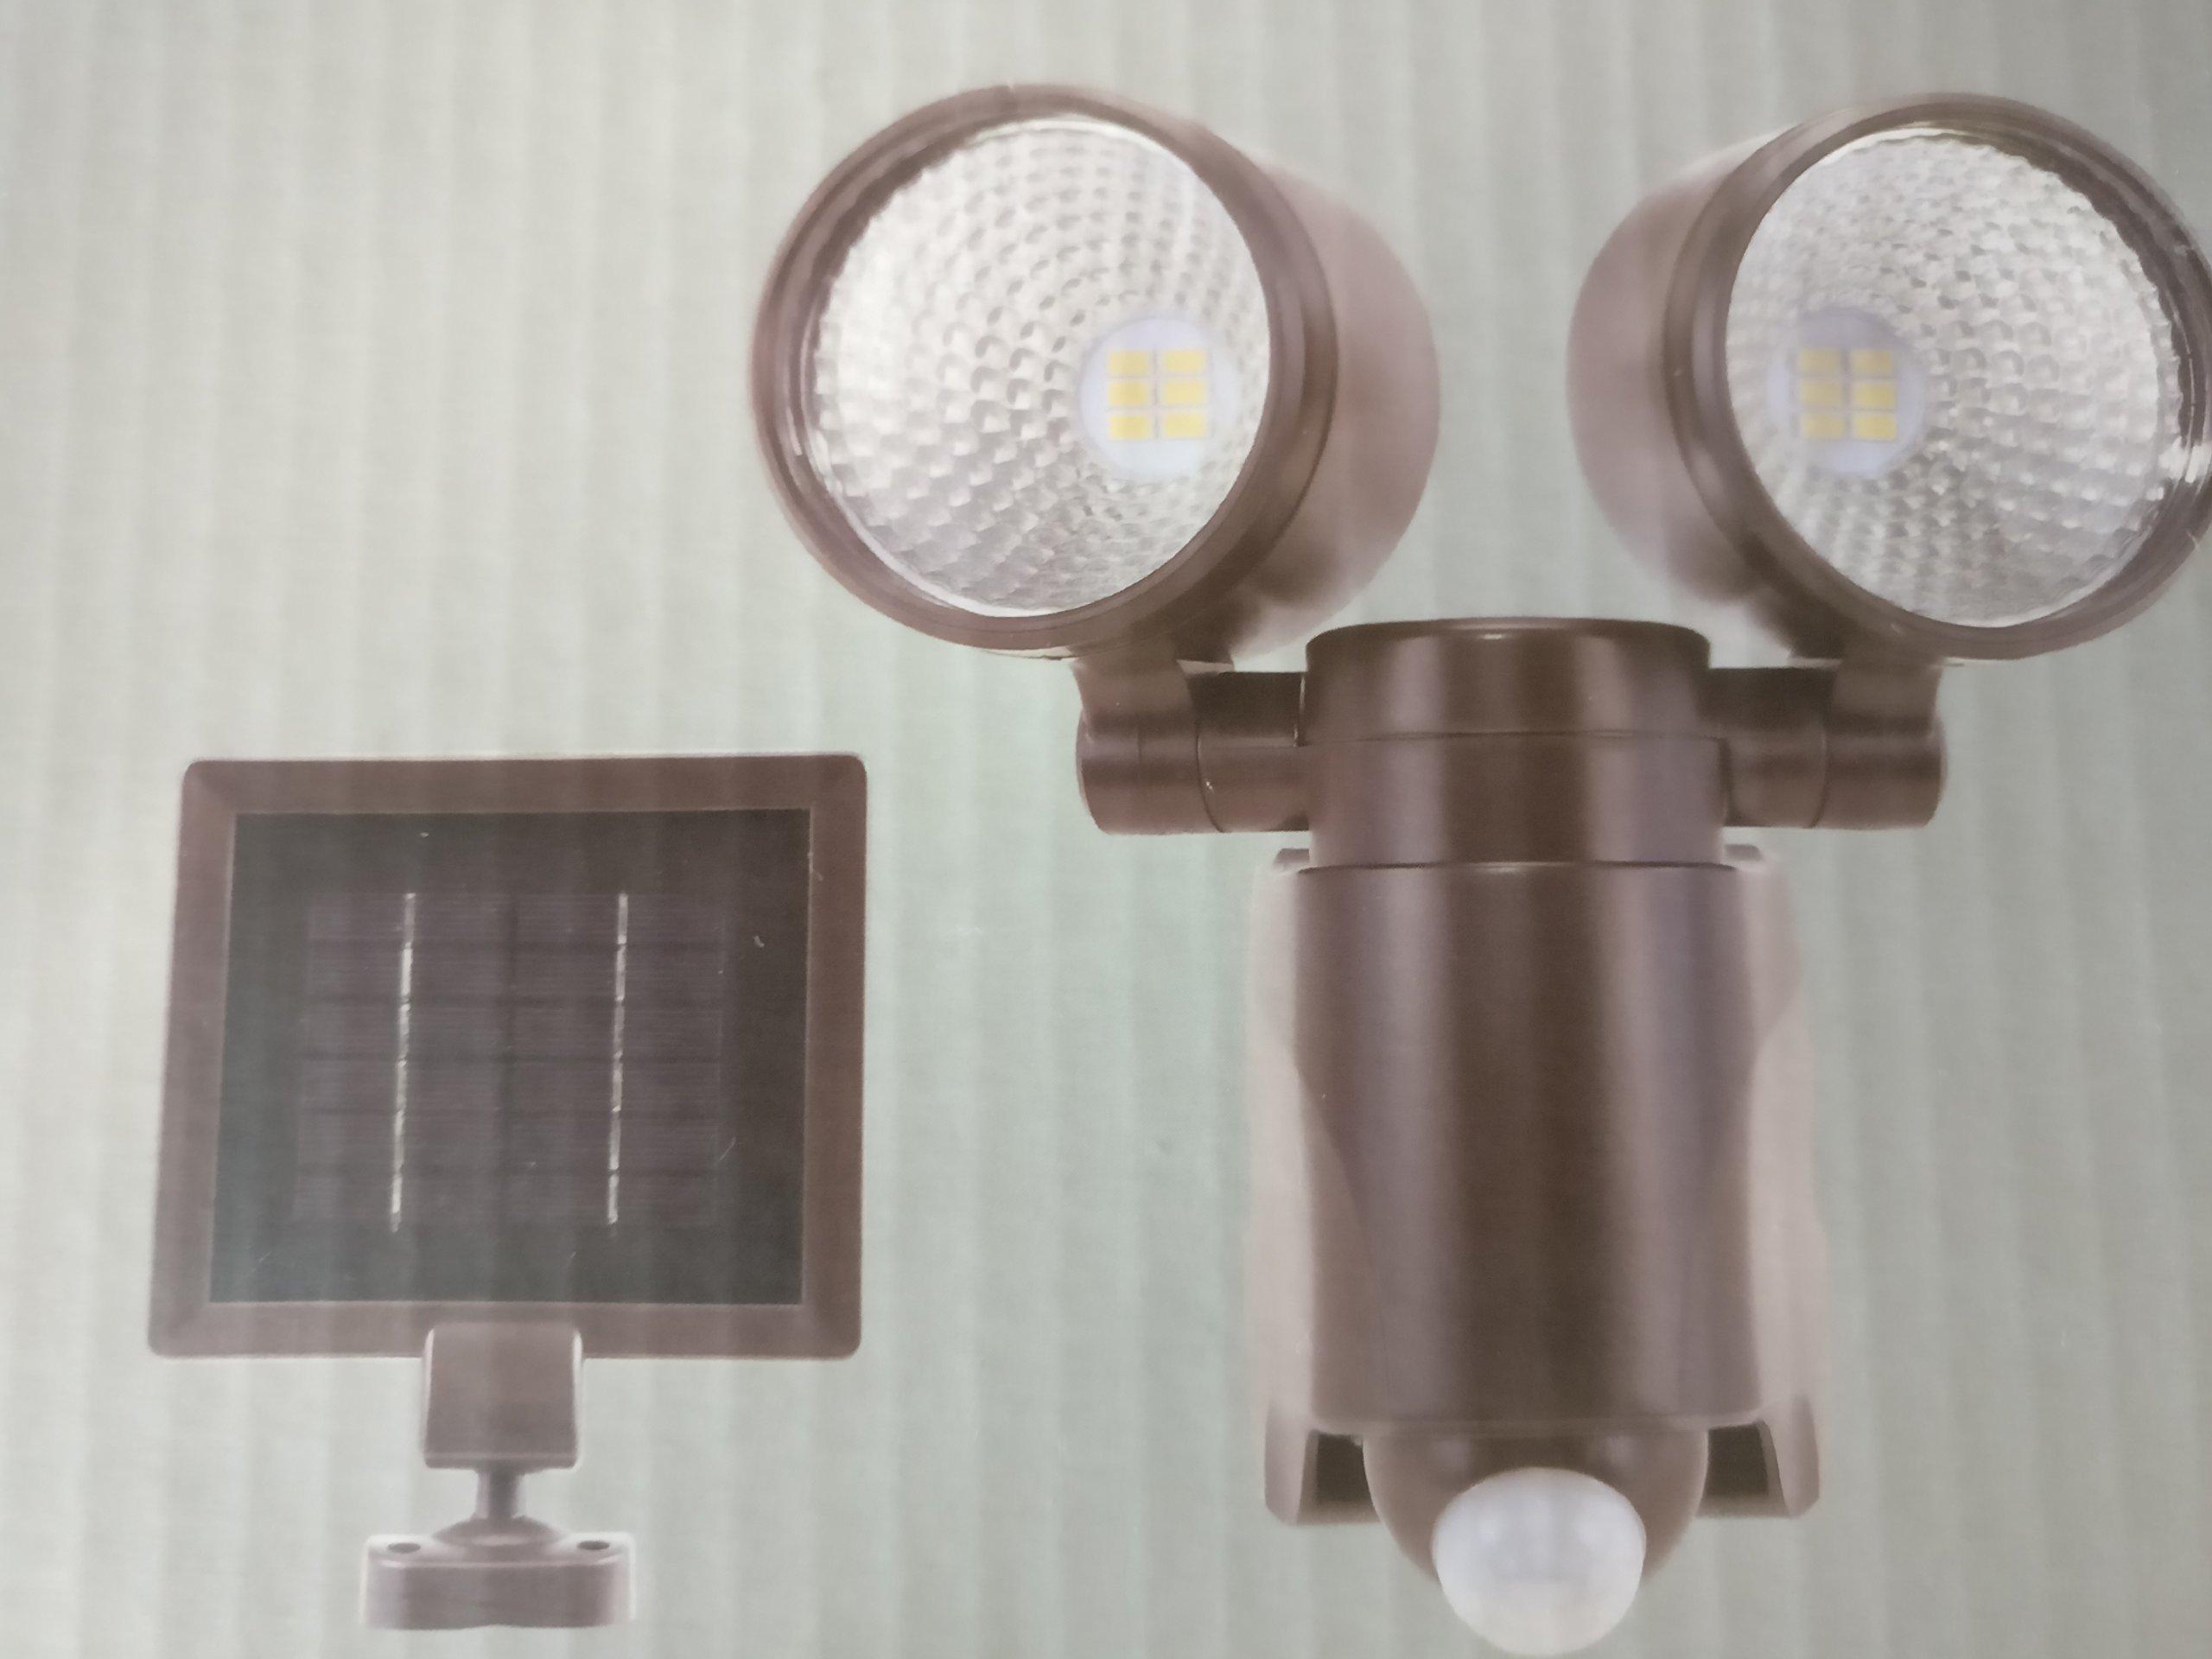 Eco-Star LED Solar Motion Double-Head Security Flood Light, 6500K, 560 Lumens, Bronze Finish